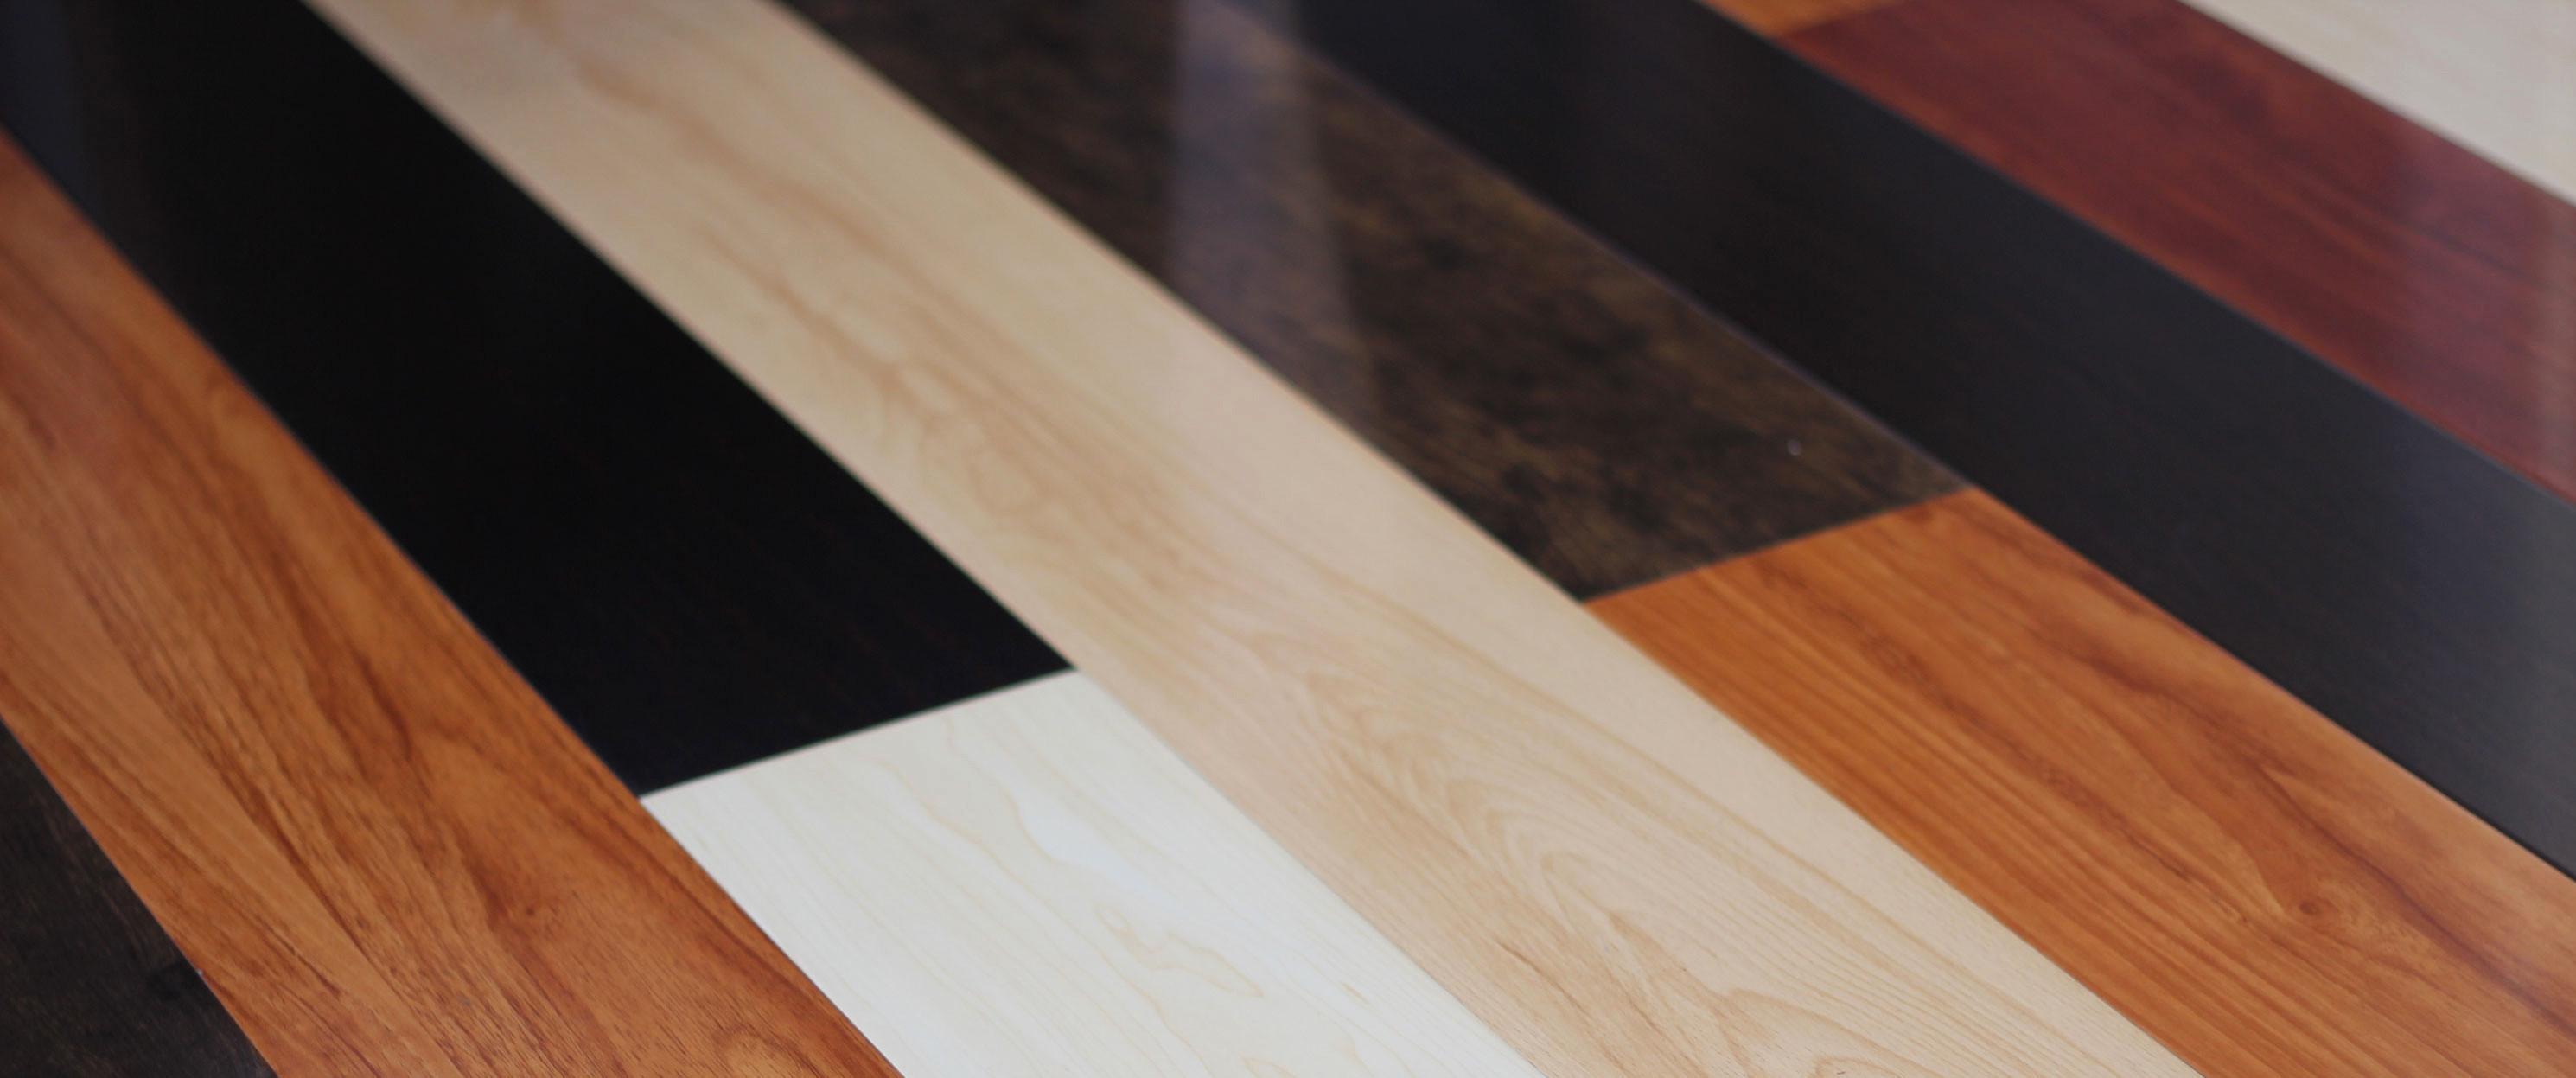 hardwood flooring sale toronto of cheap hardwood flooring for sale hardwood floor water damage warping throughout cheap hardwood flooring for sale where to buy hardwood flooring inspirational 0d grace place barnegat